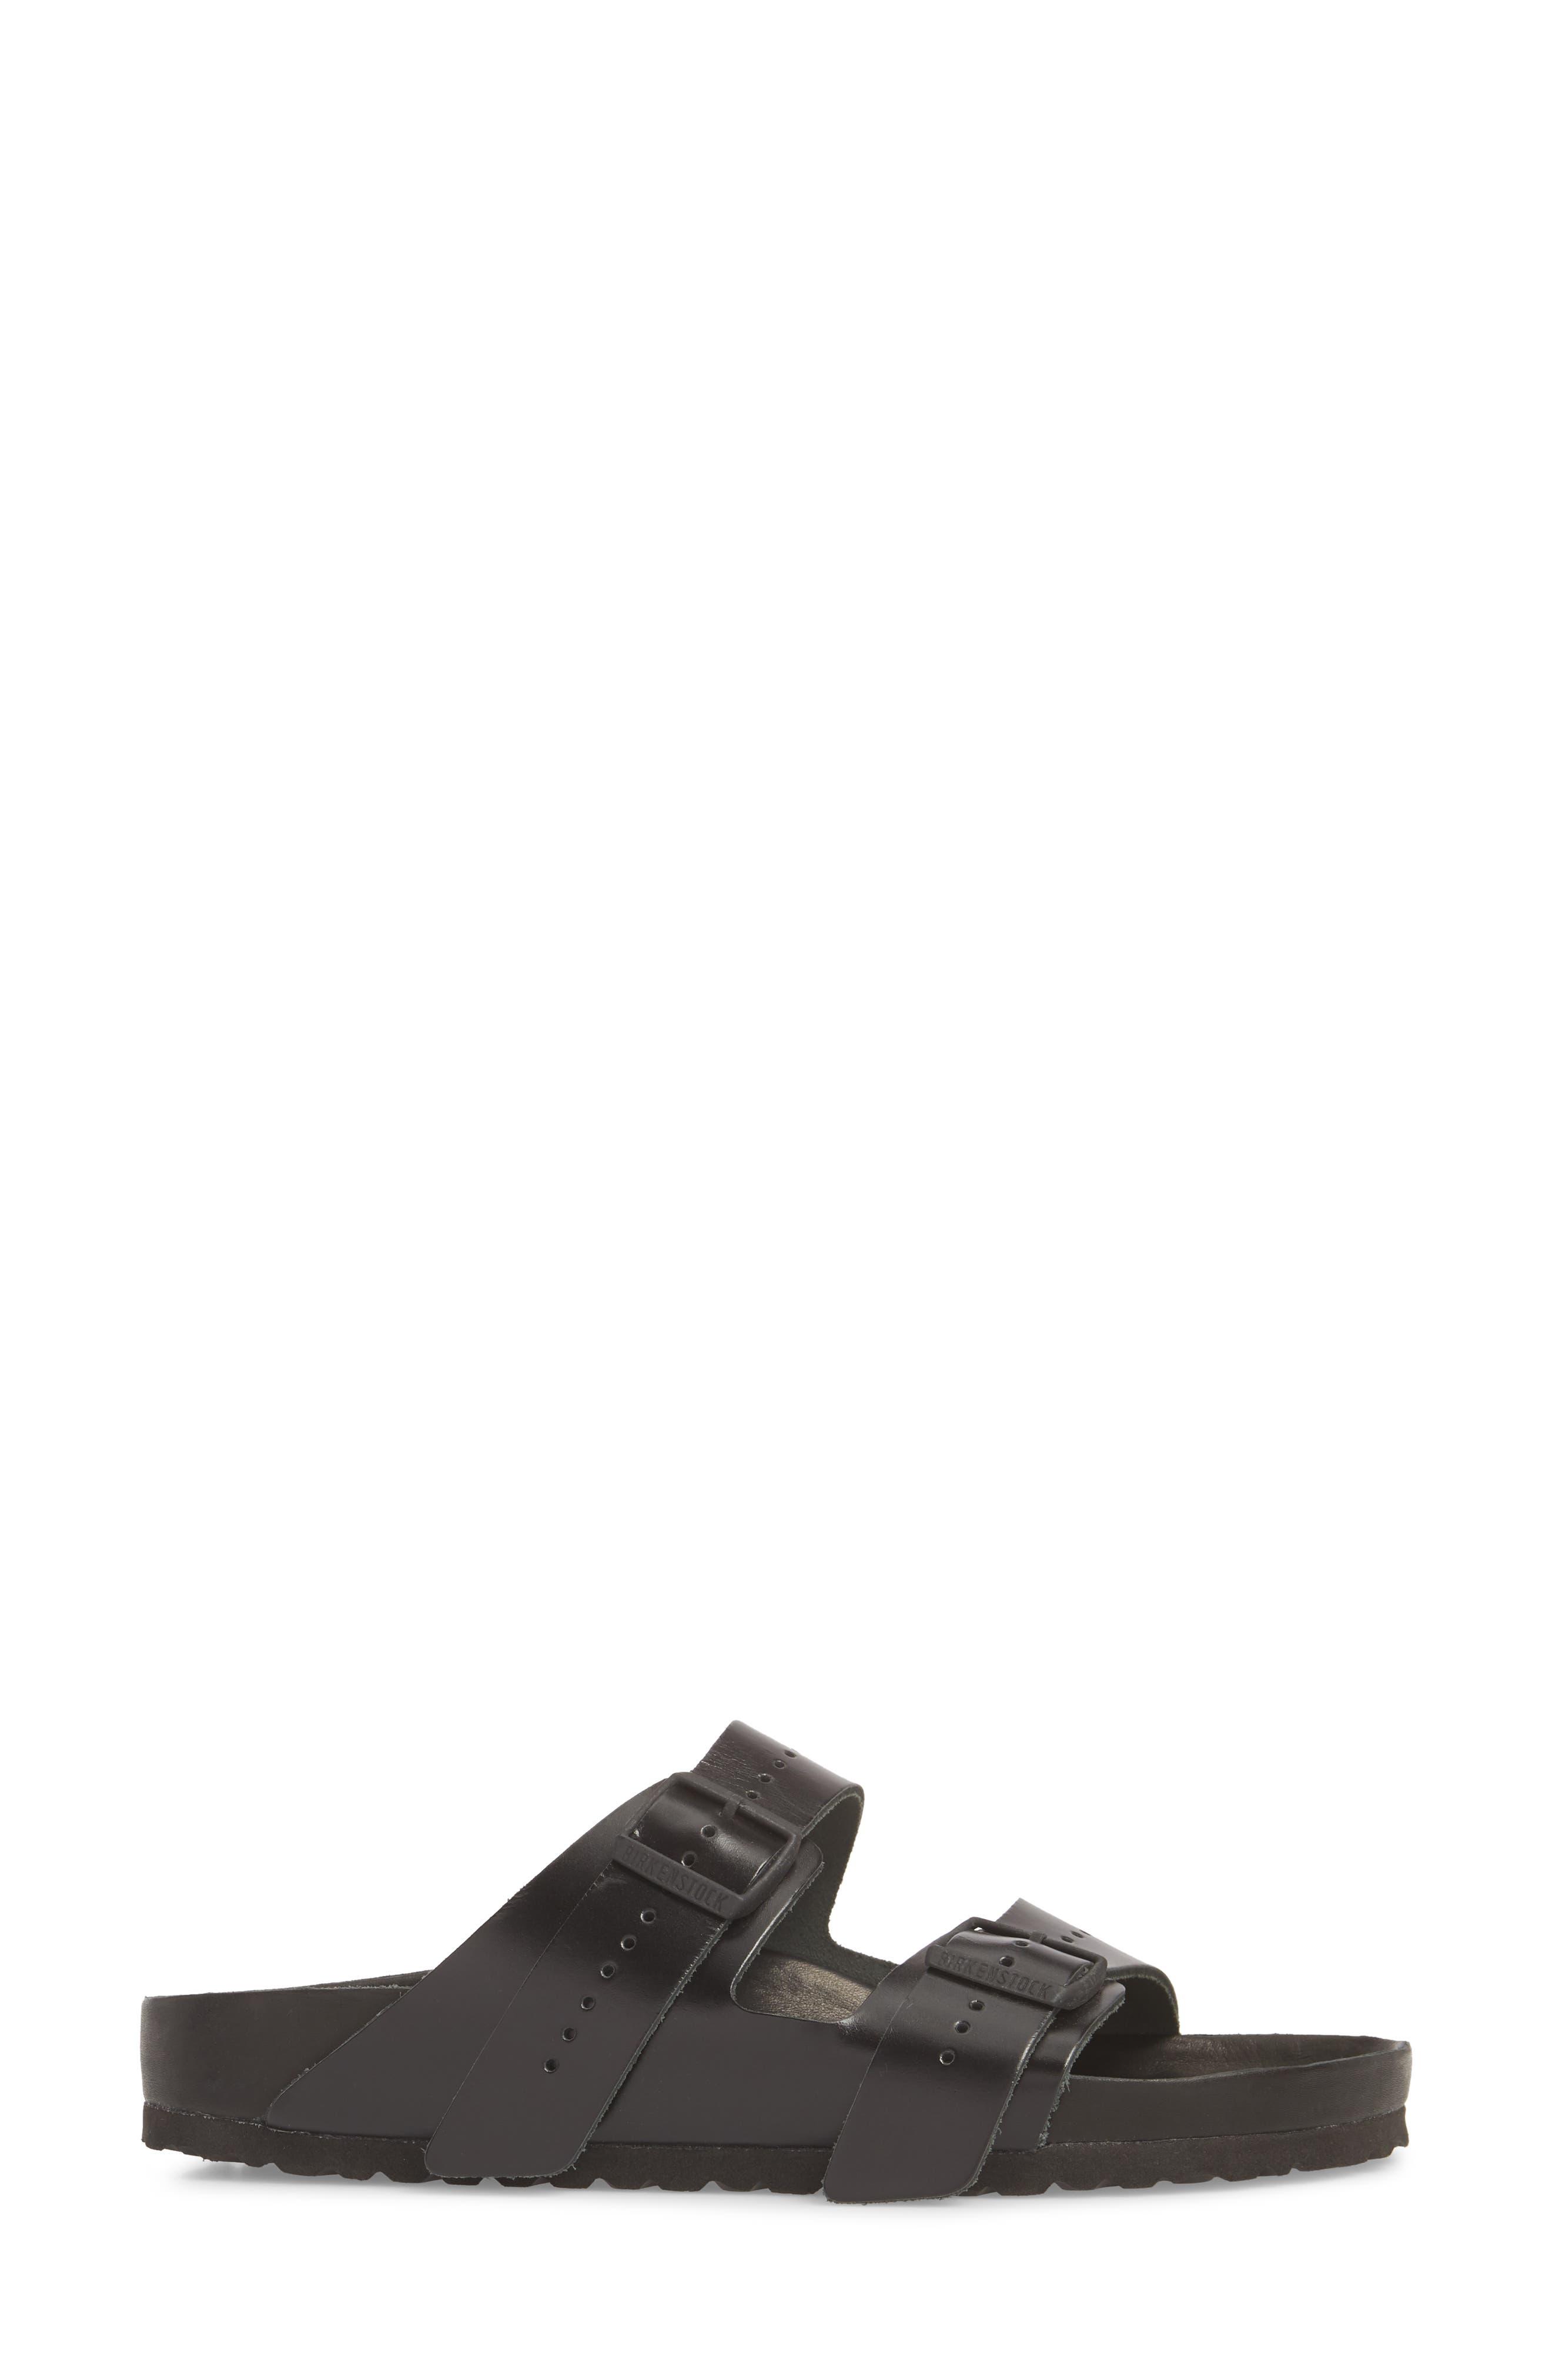 Rick Owens x Birkenstock Arizona Sandal,                             Alternate thumbnail 3, color,                             BLACK/ BLACK